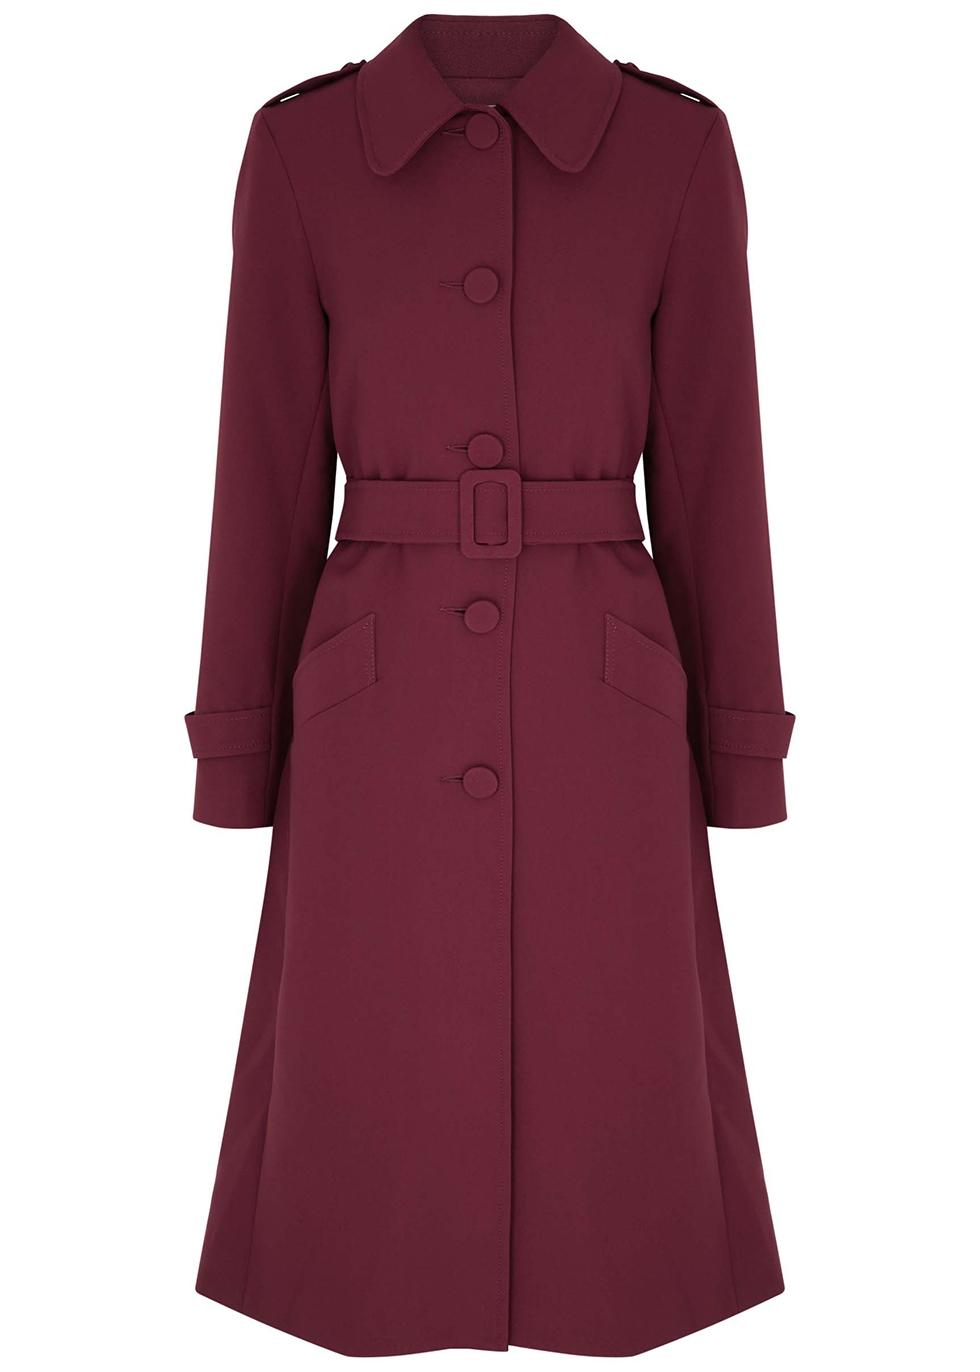 Nesta burgundy belted jersey coat